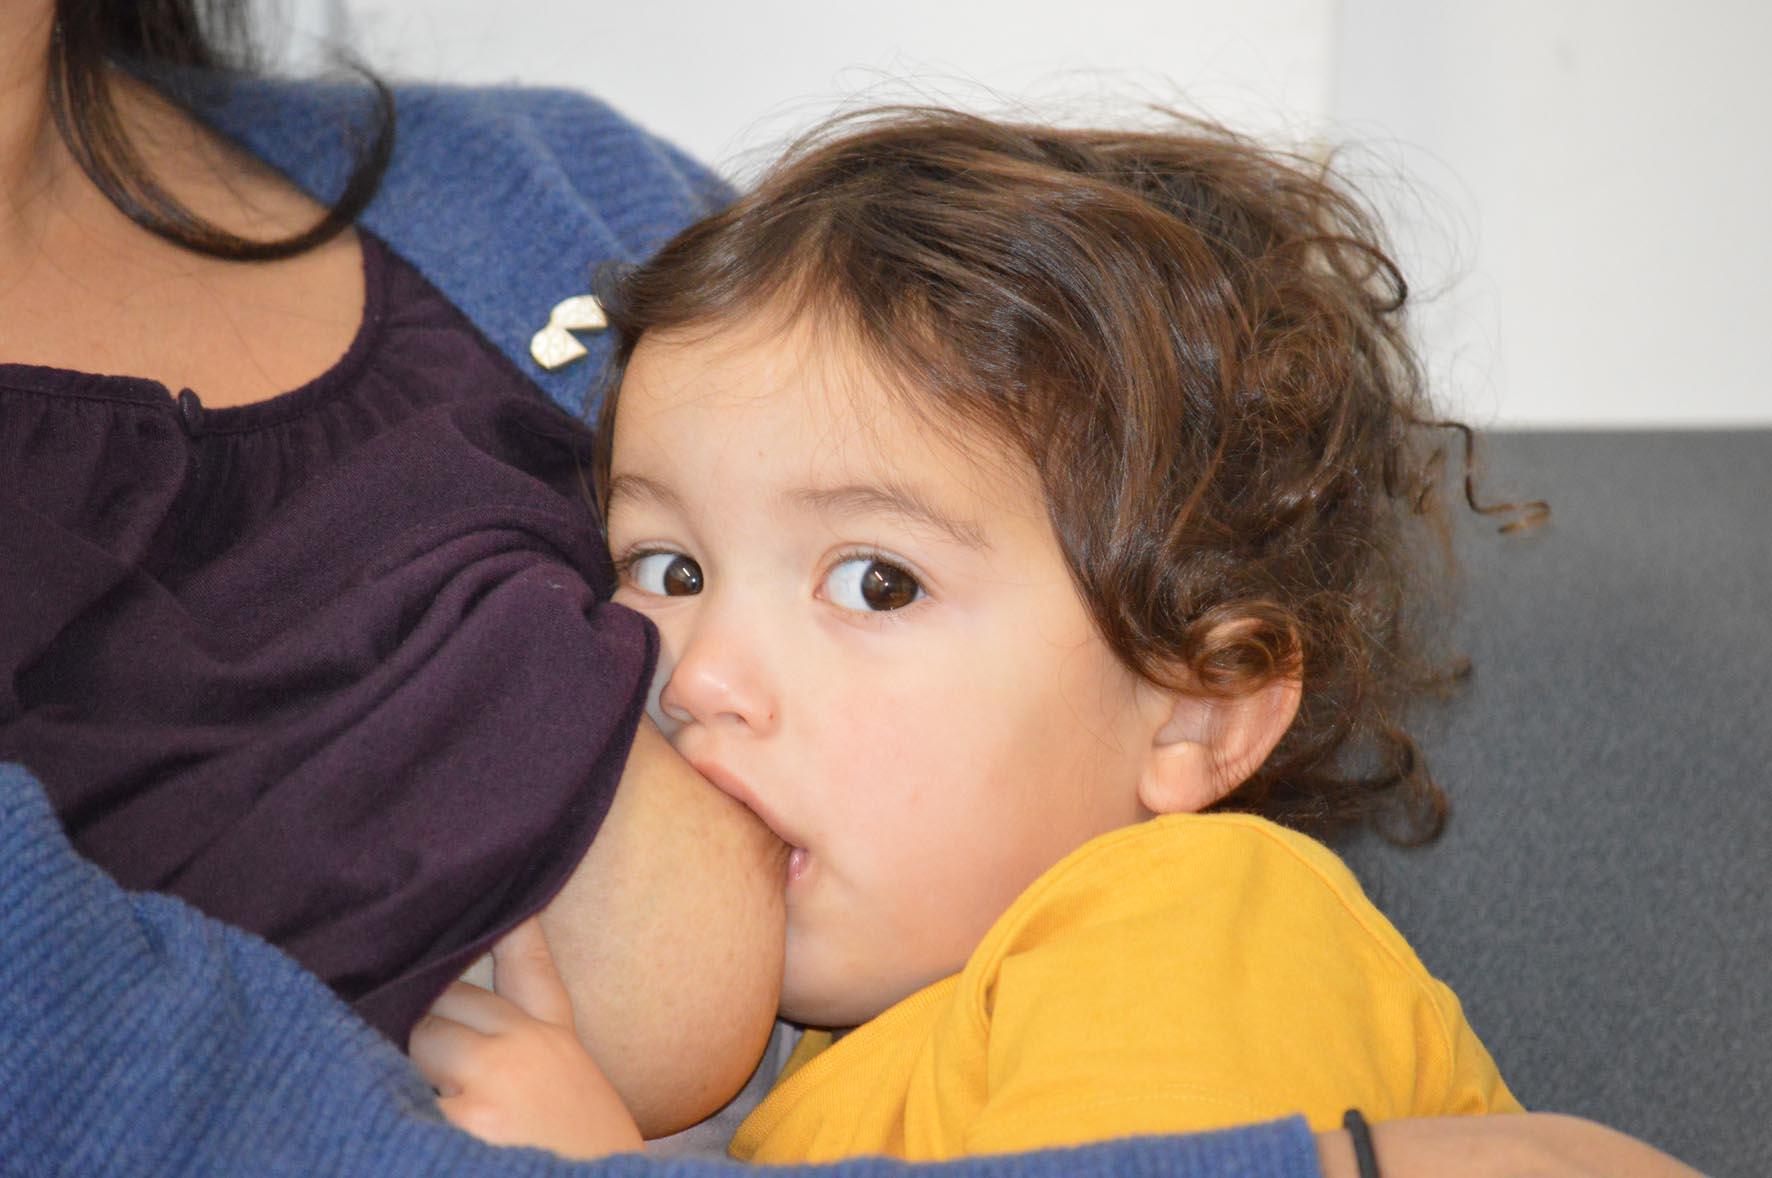 Photograph of toddler breastfeeding